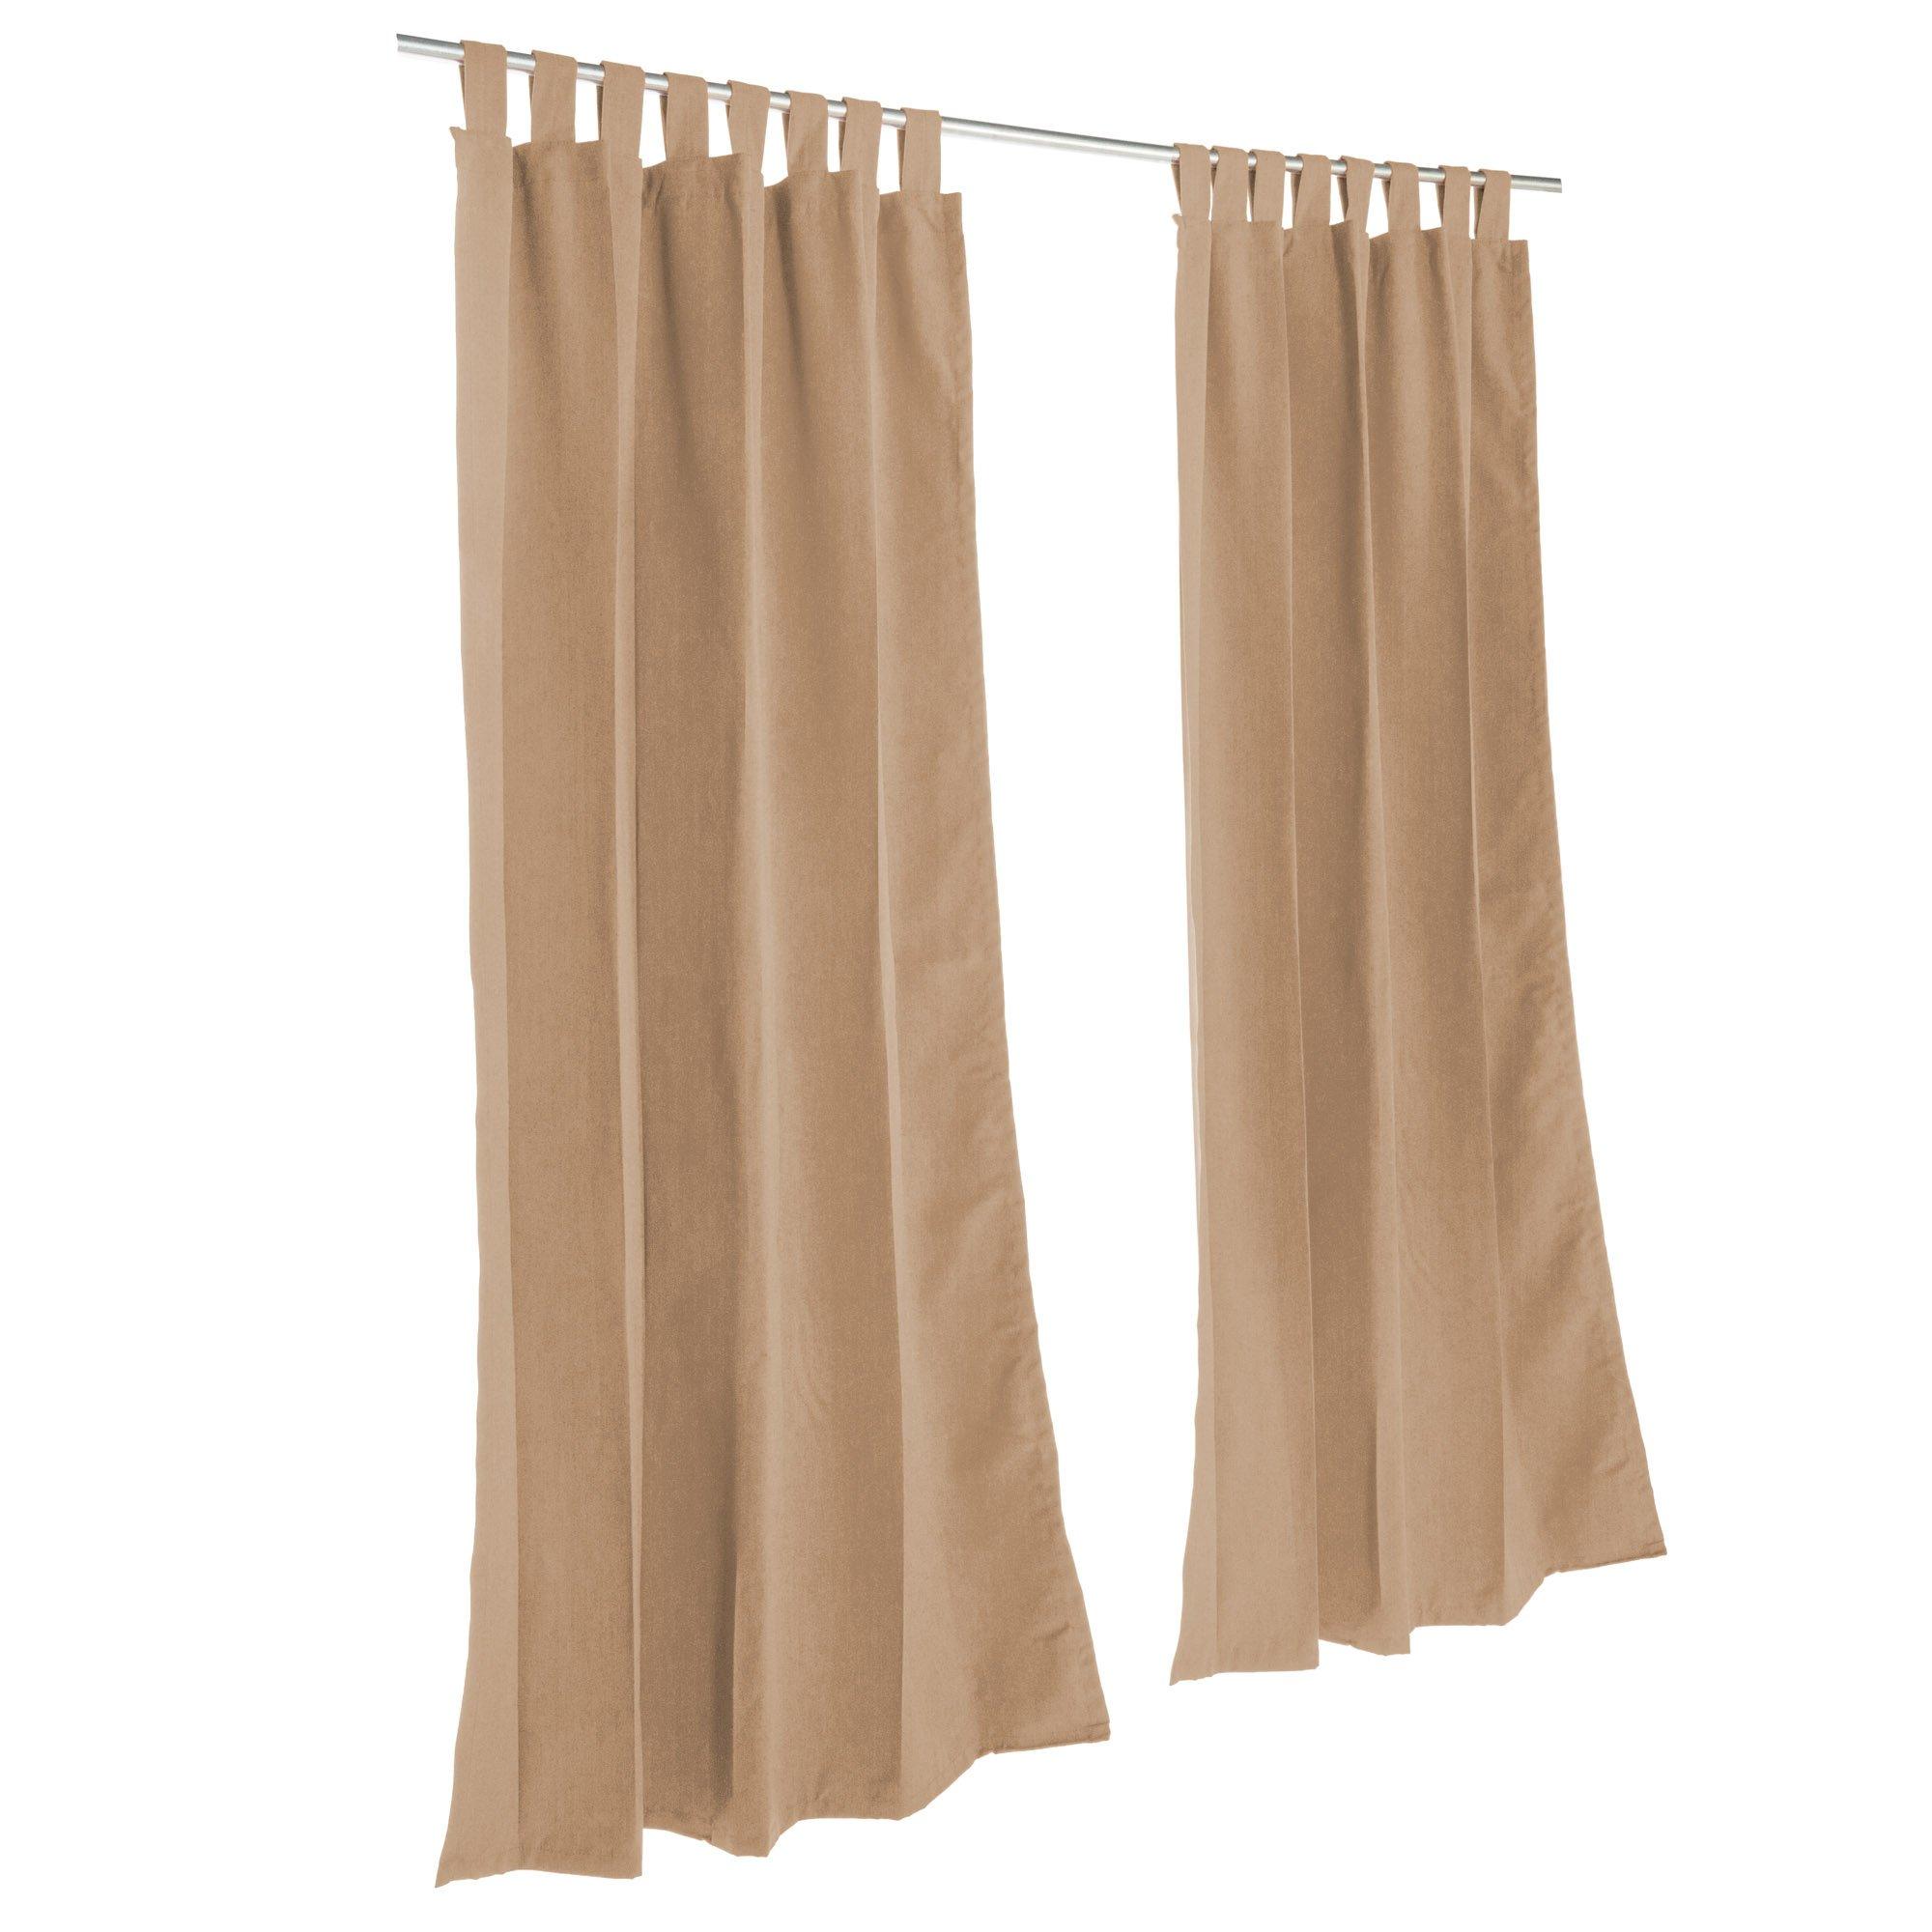 Pawleys Island Sunbrella Outdoor Gazebo Tabbed Solid Curtain Panel Canvas Cocoa 50'' x 120''